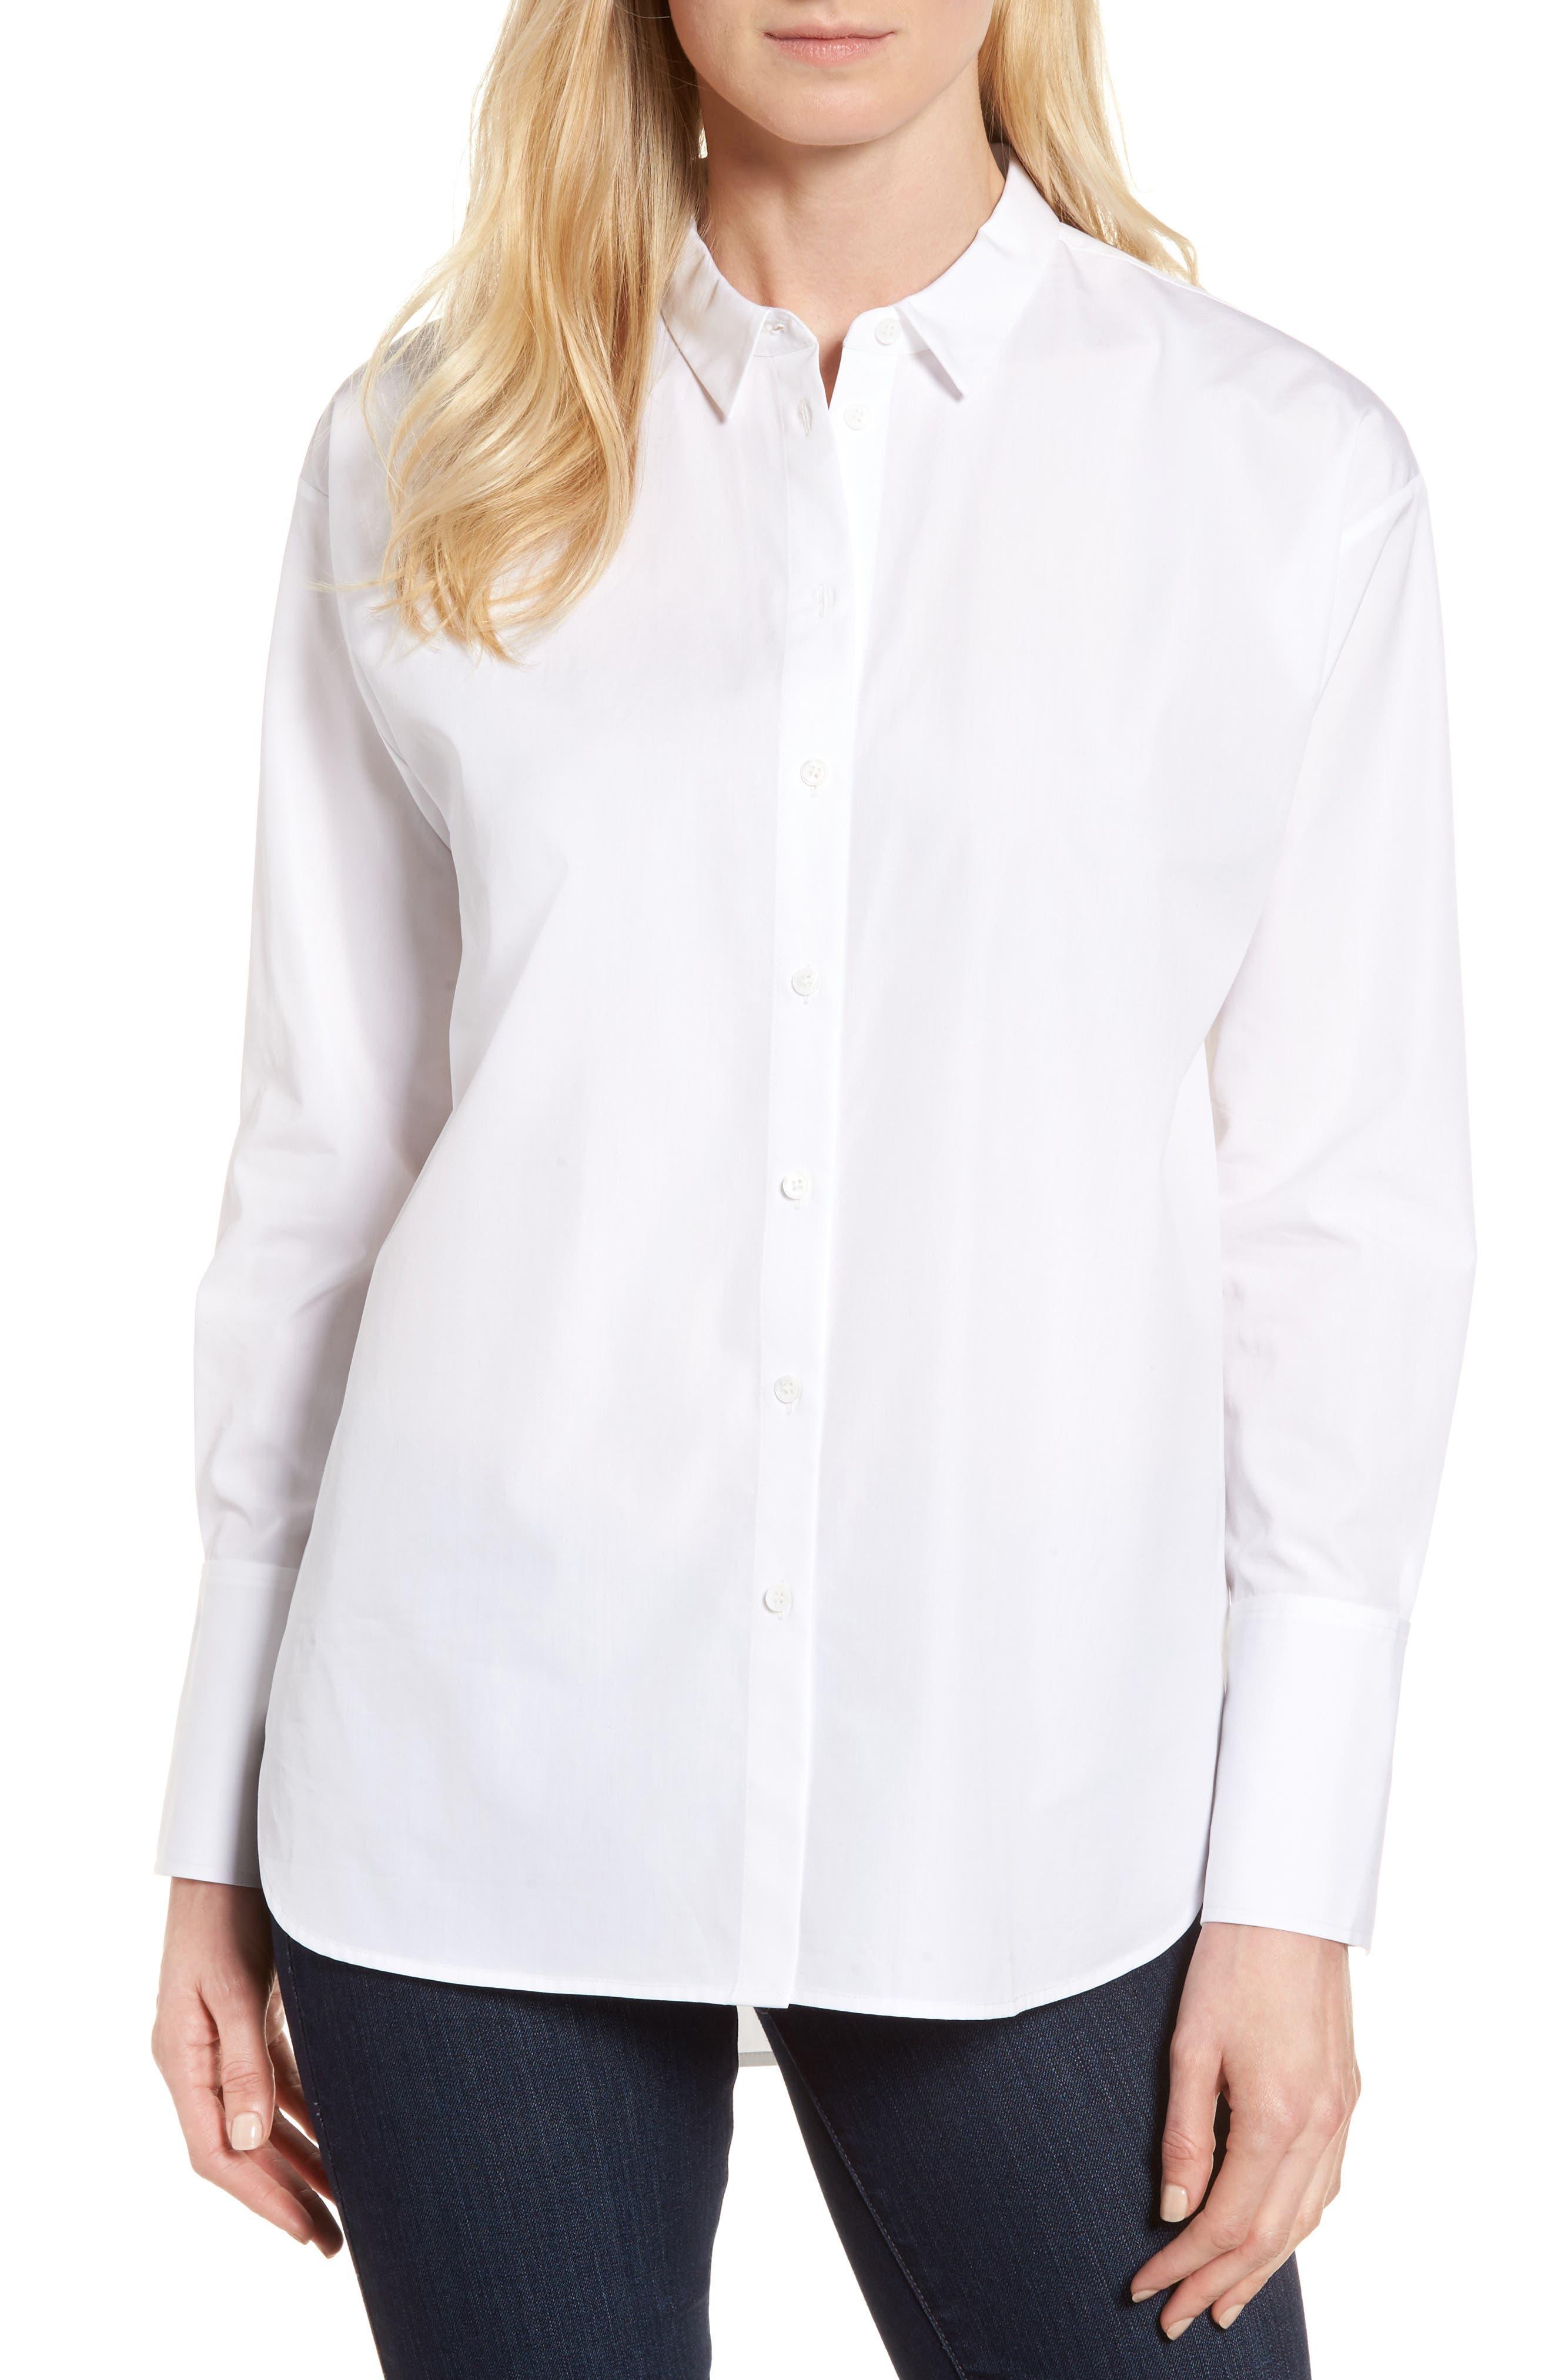 Main Image - Nordstrom Signature Poplin Shirt